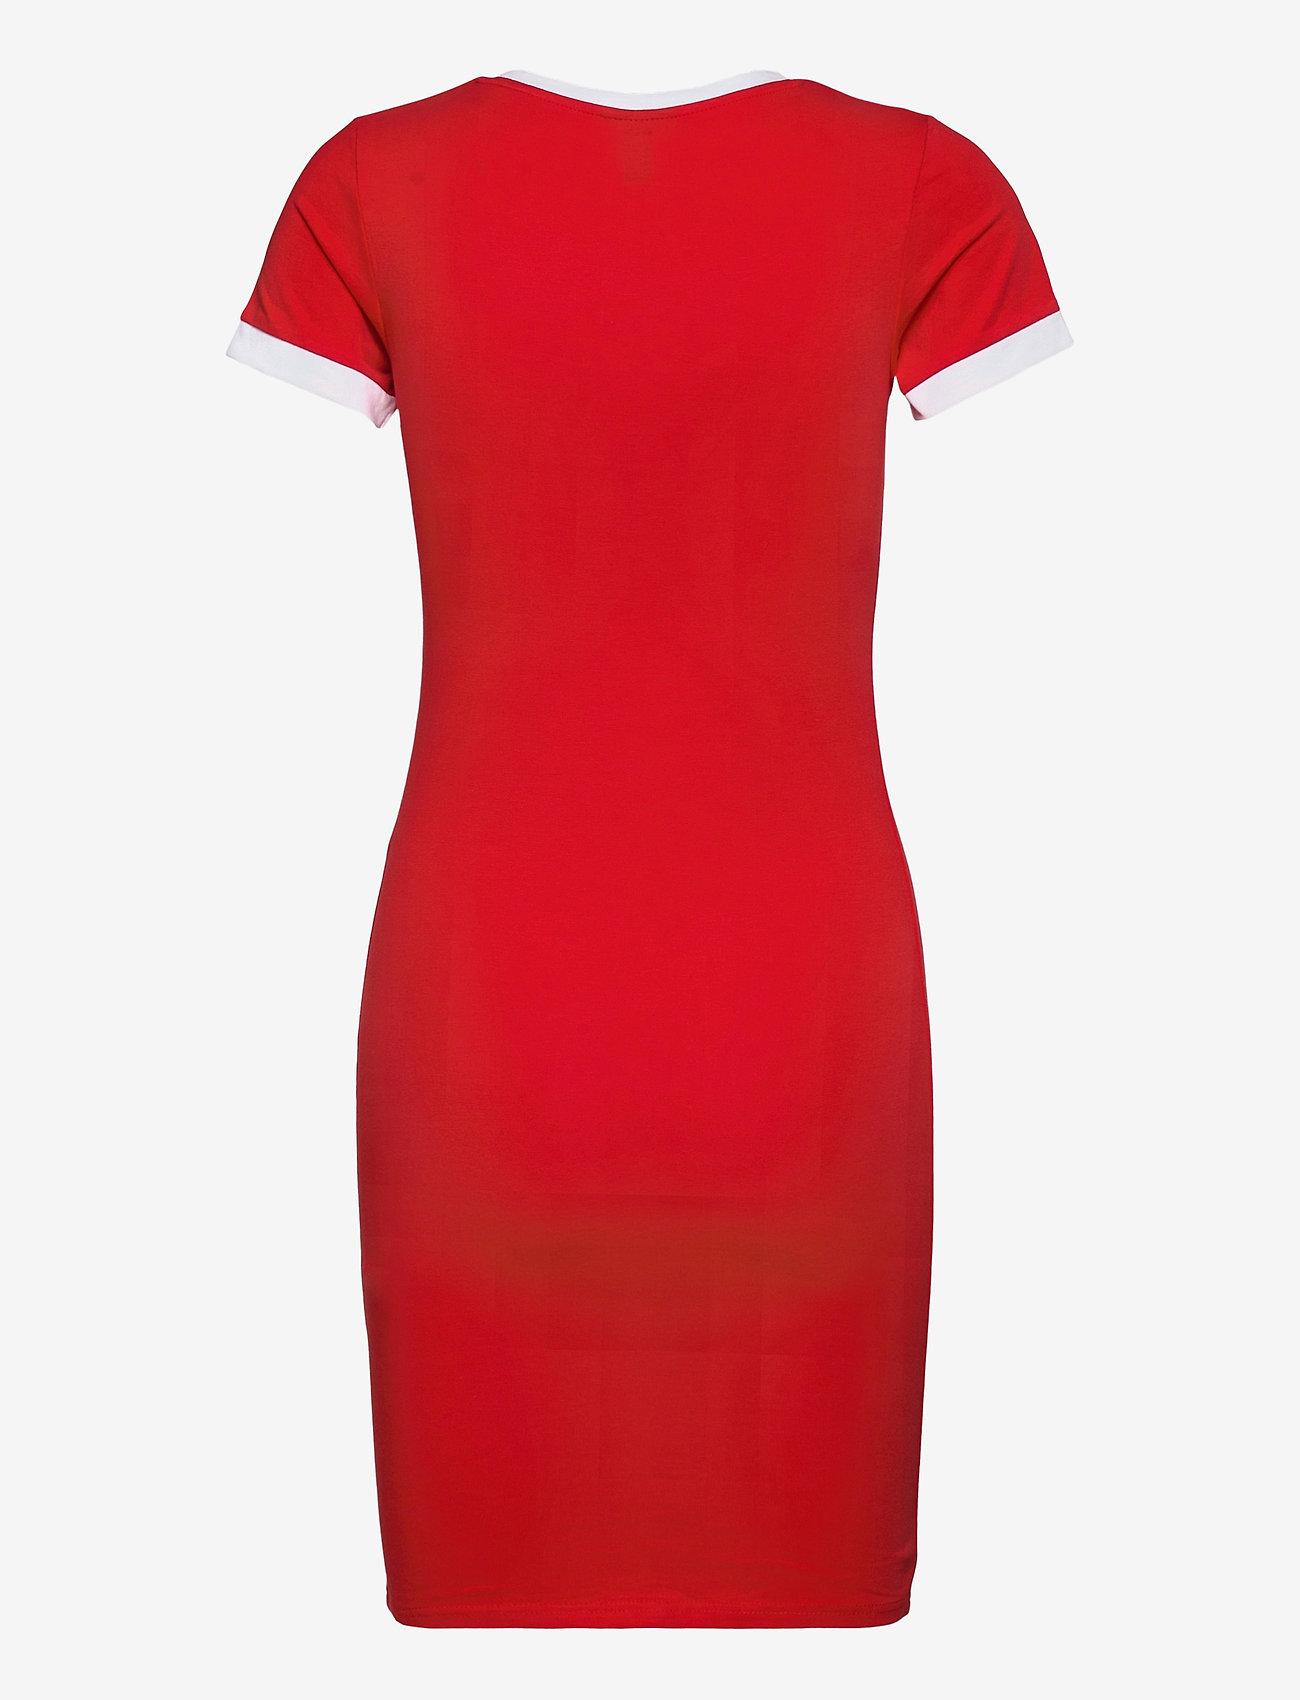 Ellesse - EL NINETTA DRESS - summer dresses - red - 1